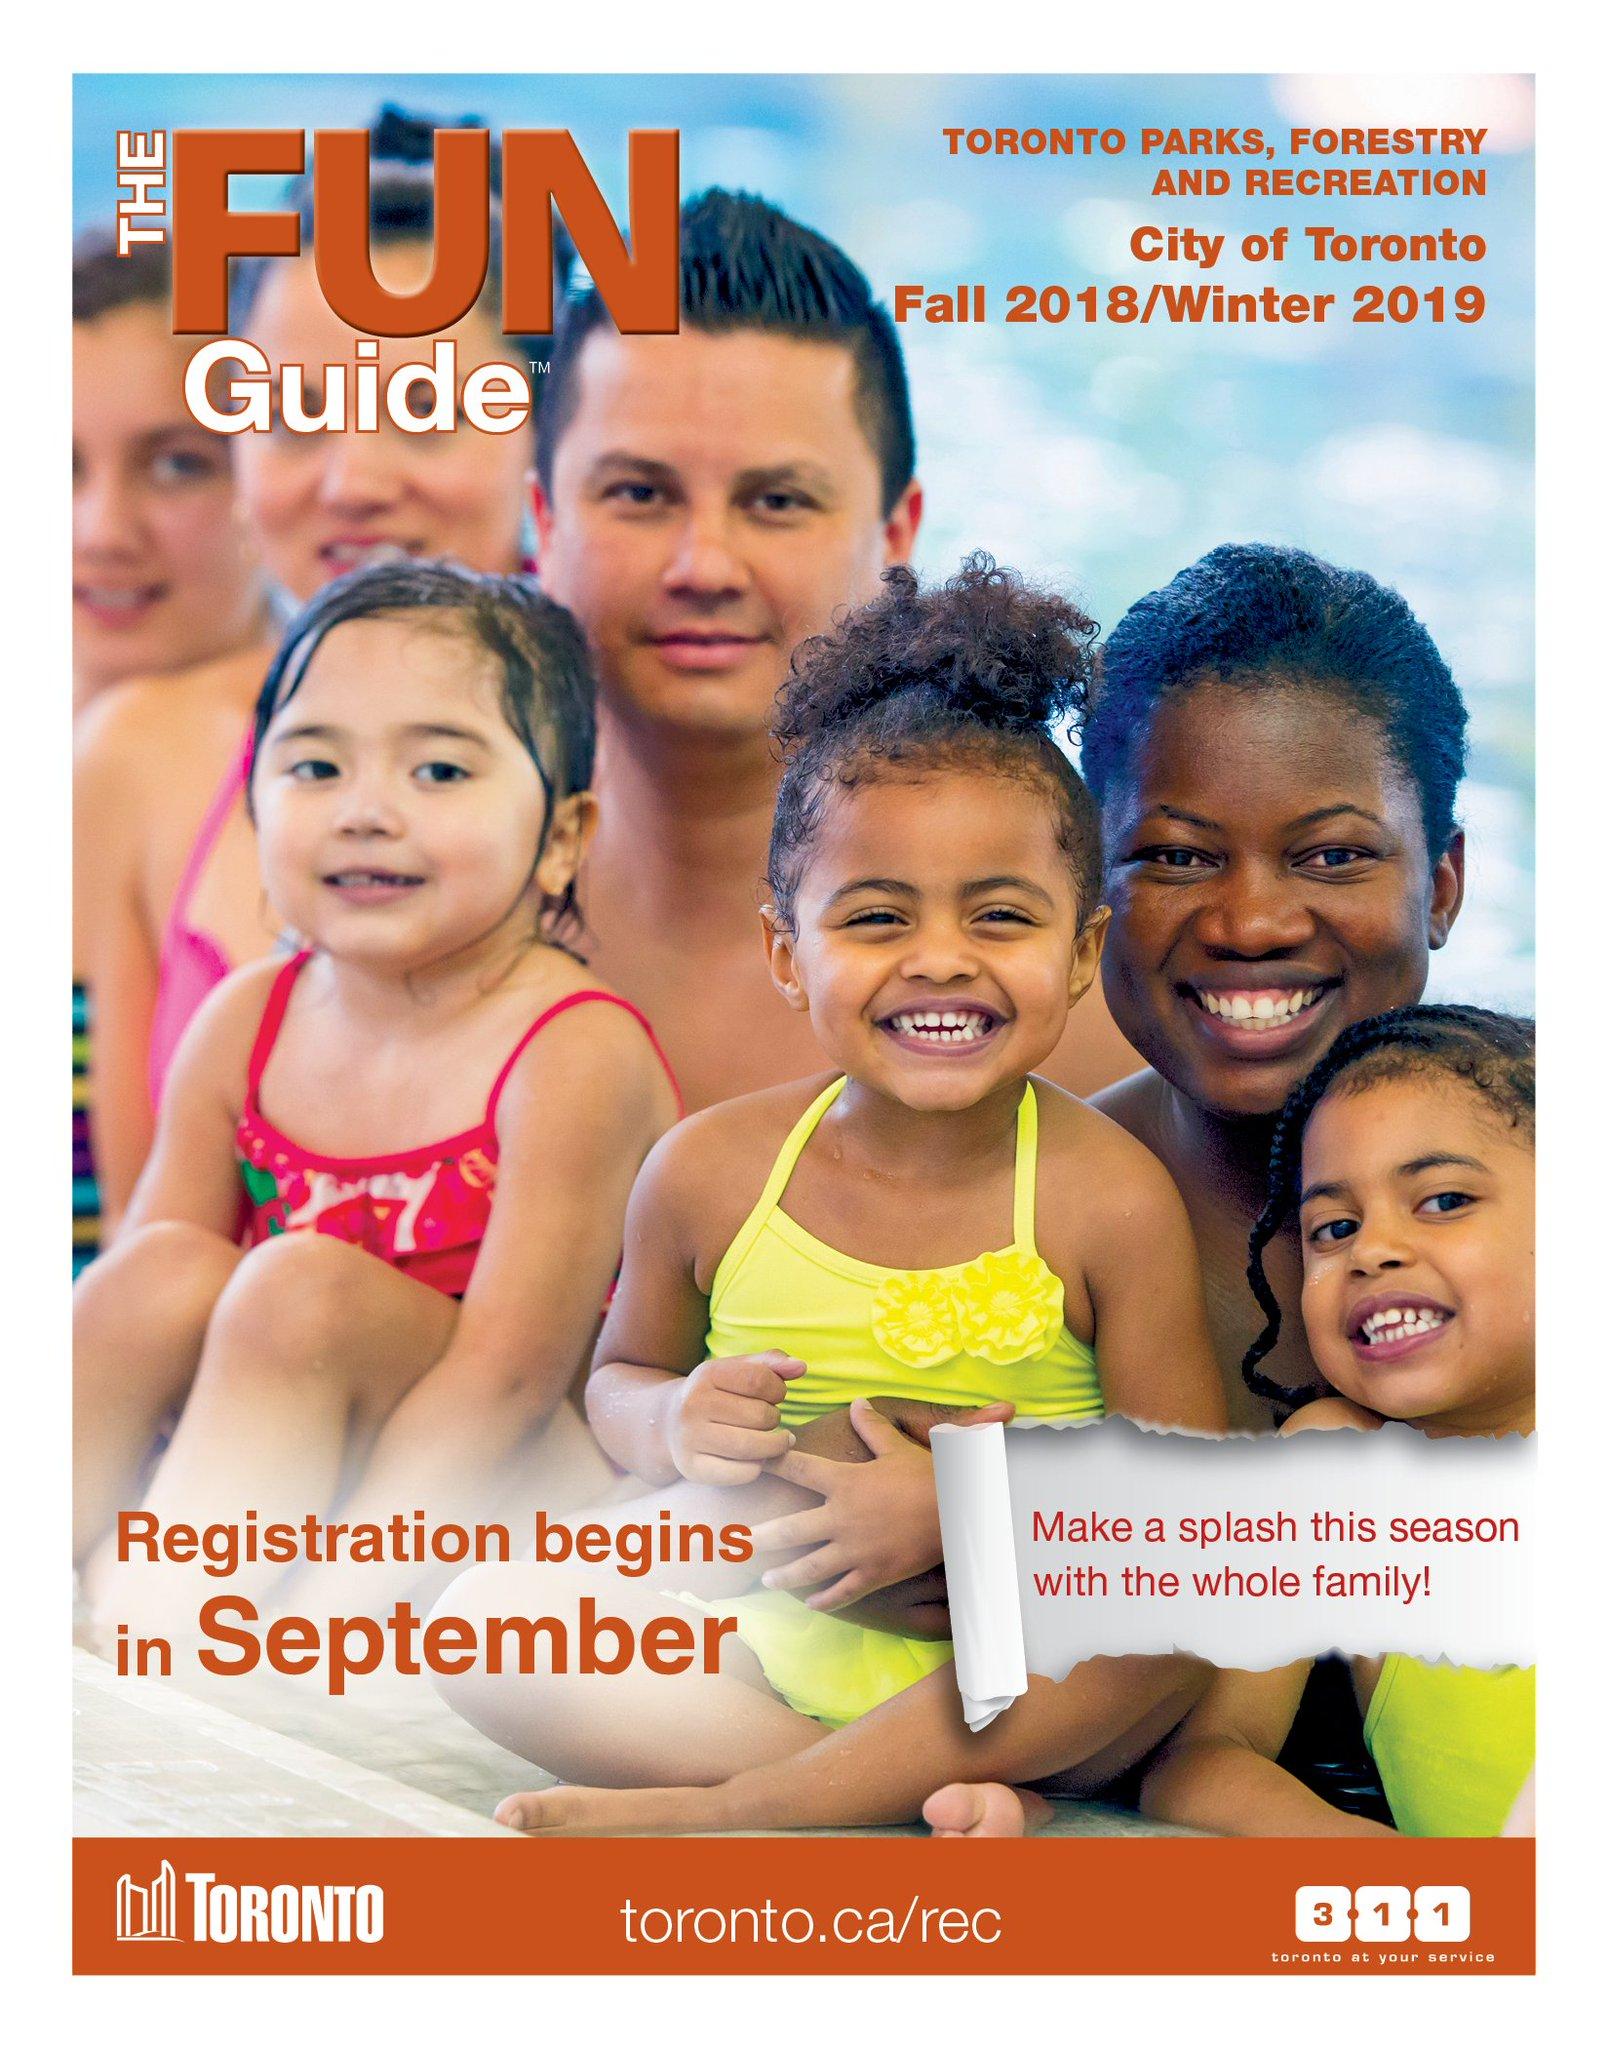 City of toronto fall & winter 2015/16 program registration.